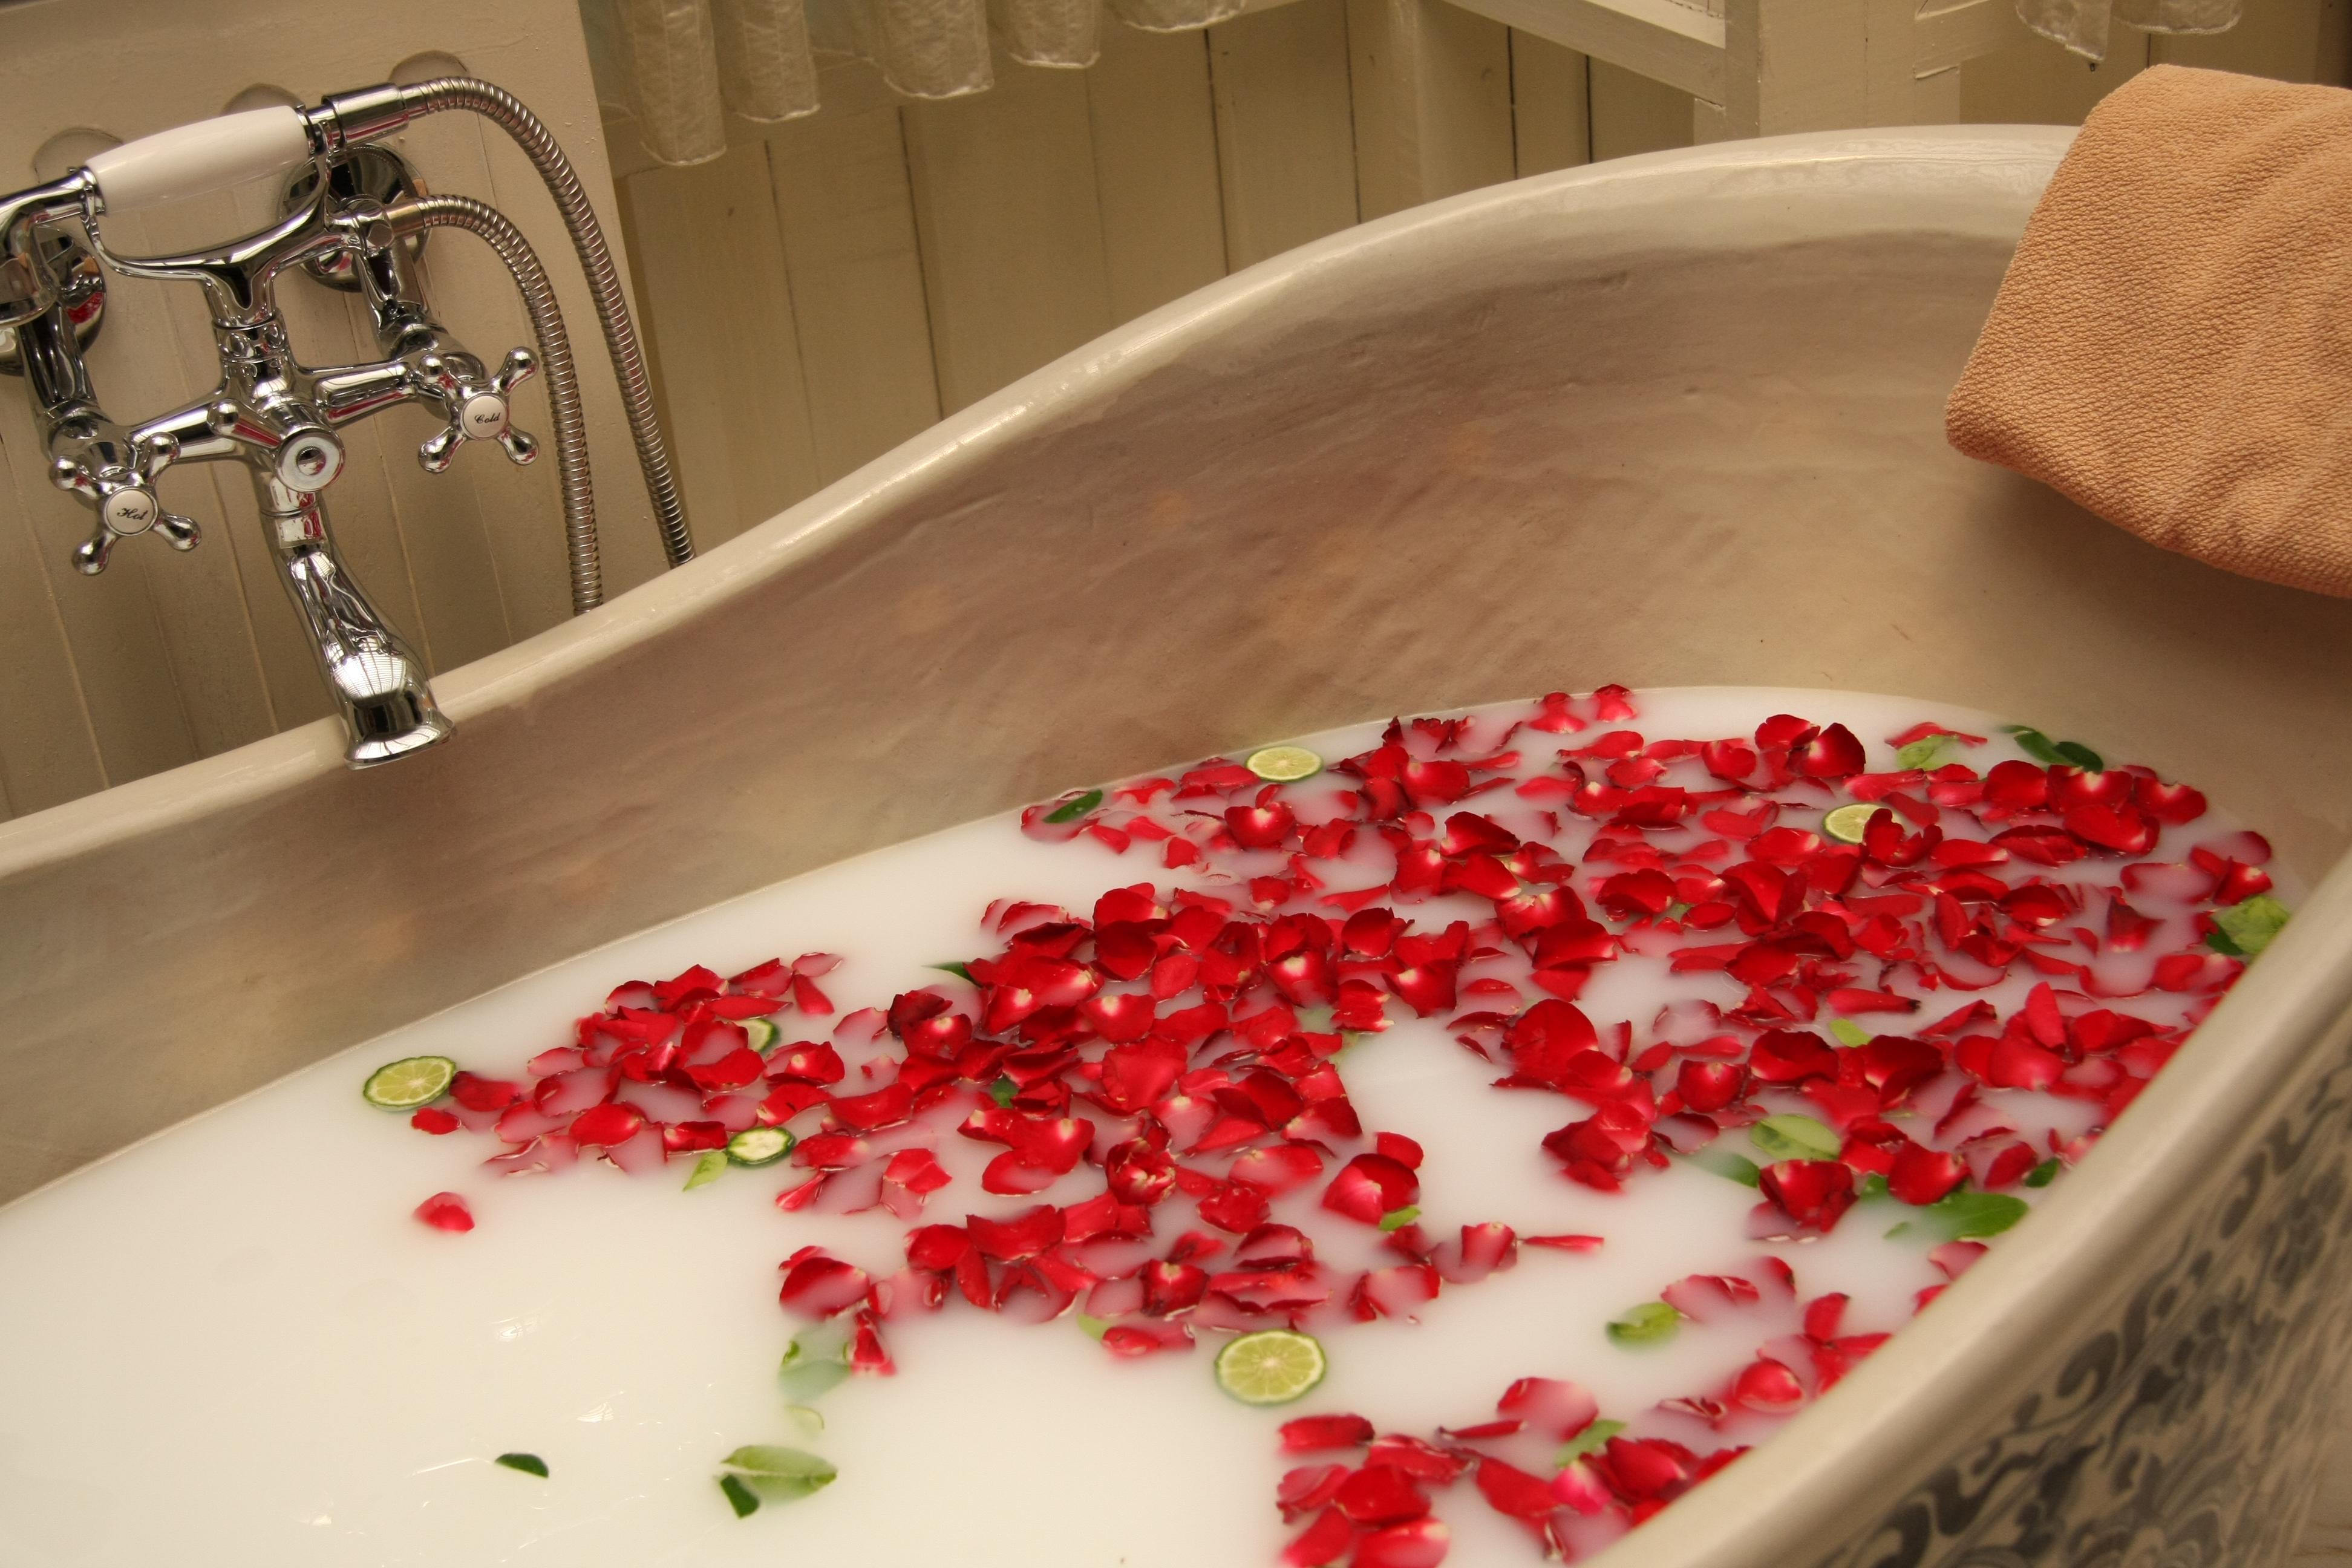 Фото девушек в ванне с лепестками роз 14 фотография